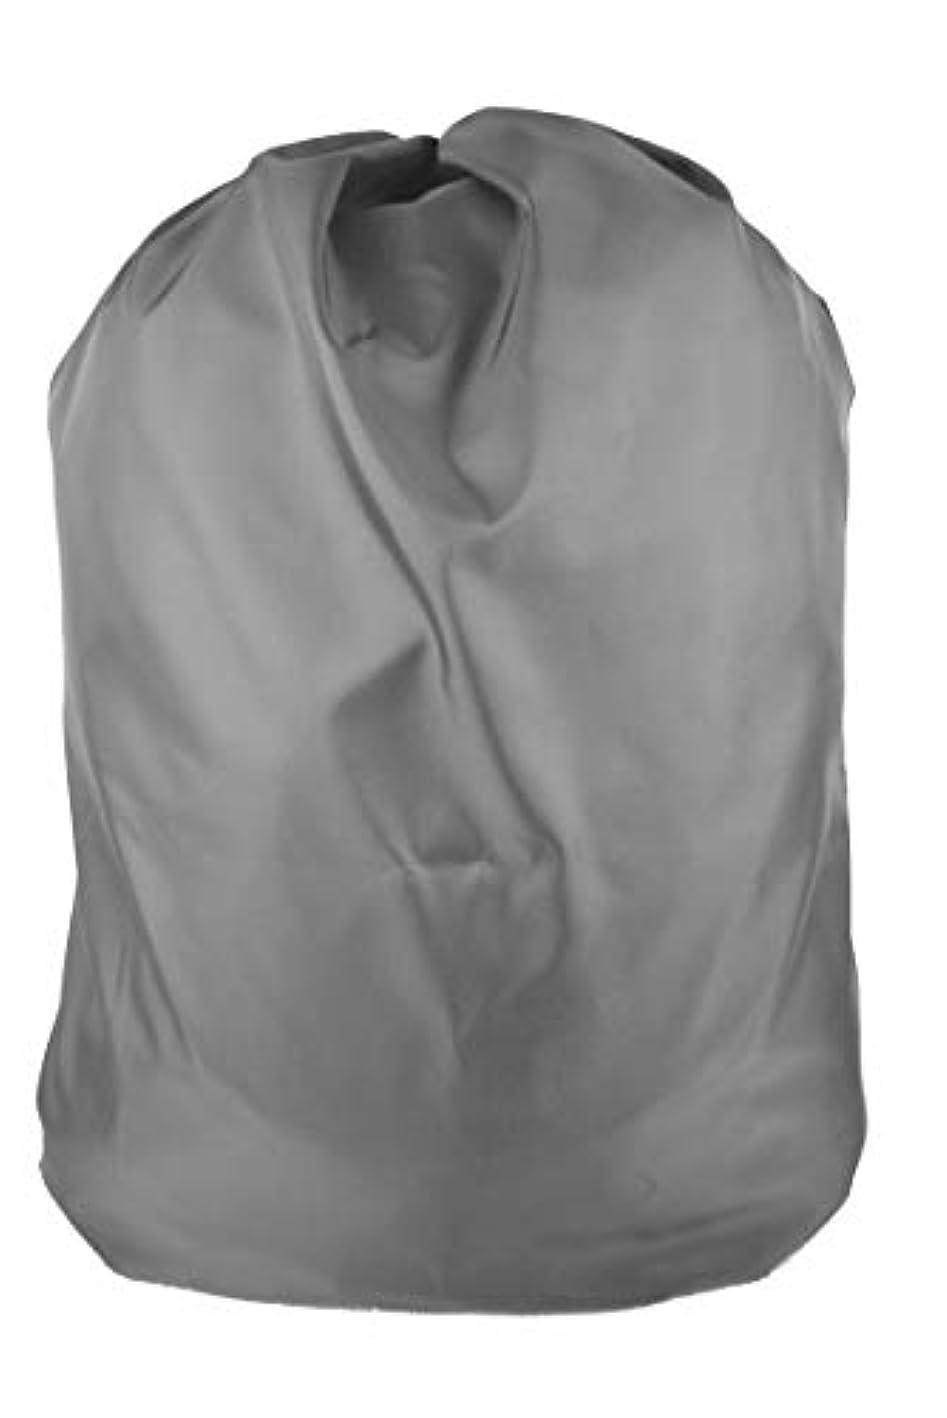 Heavy Duty Nylon Laundry Storage Bags with Drawstring, Durable, Machine Washable 30' x 40